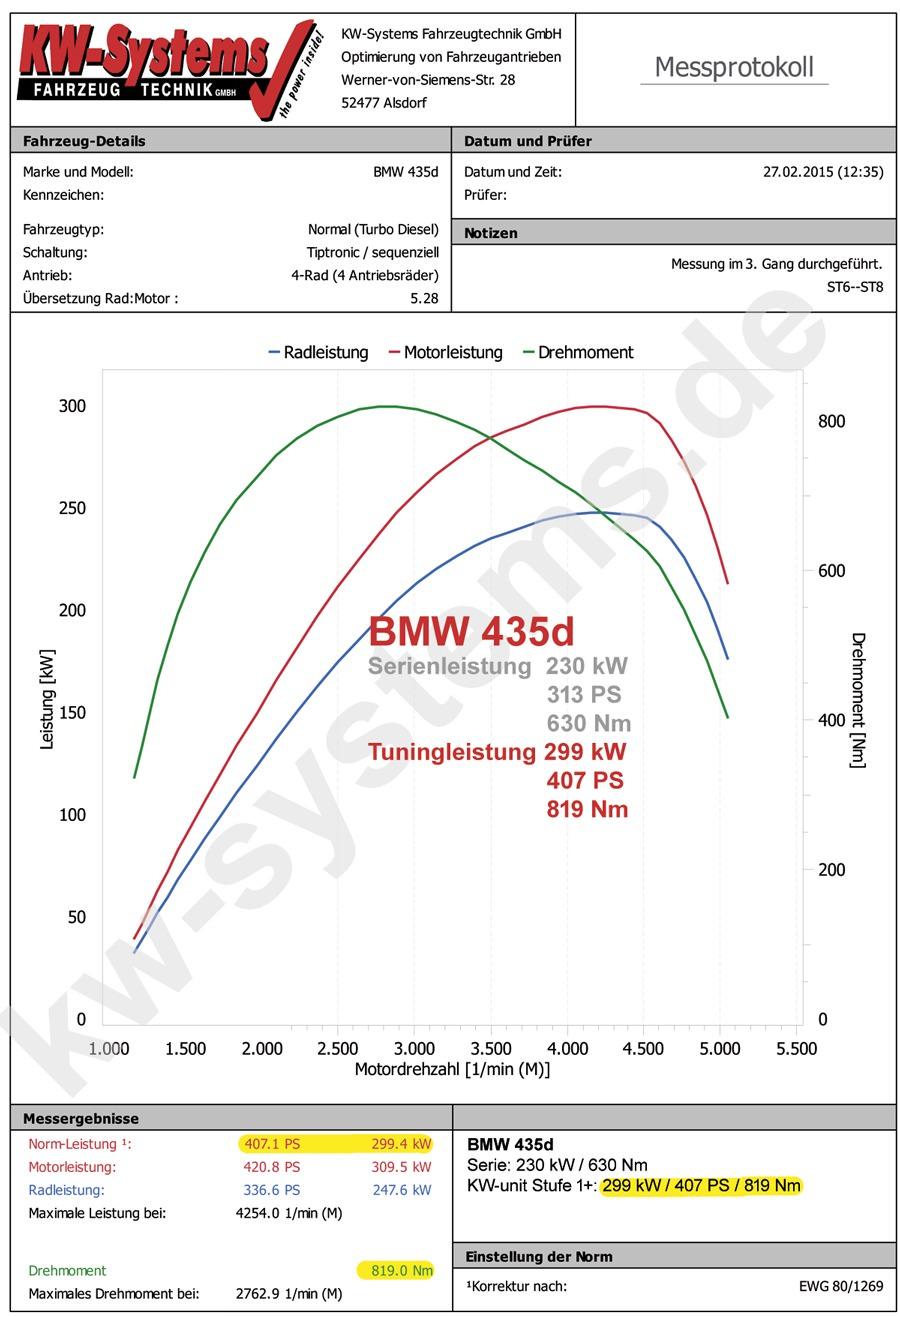 NEWS | KW-Systems Fahrzeugtechnik